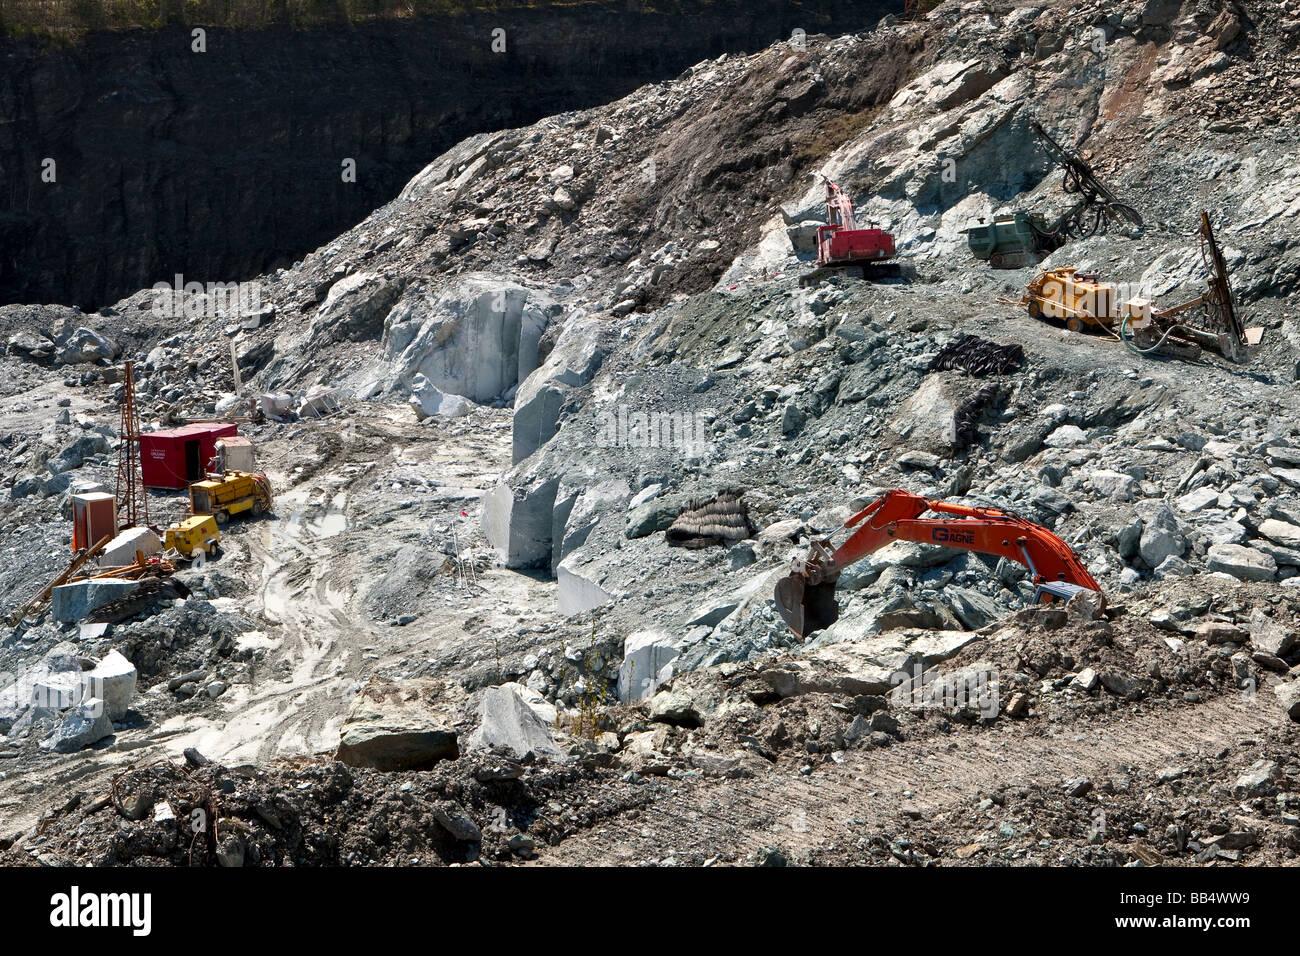 Asbestos mining site near Thetford Mines Quebec Canada - Stock Image